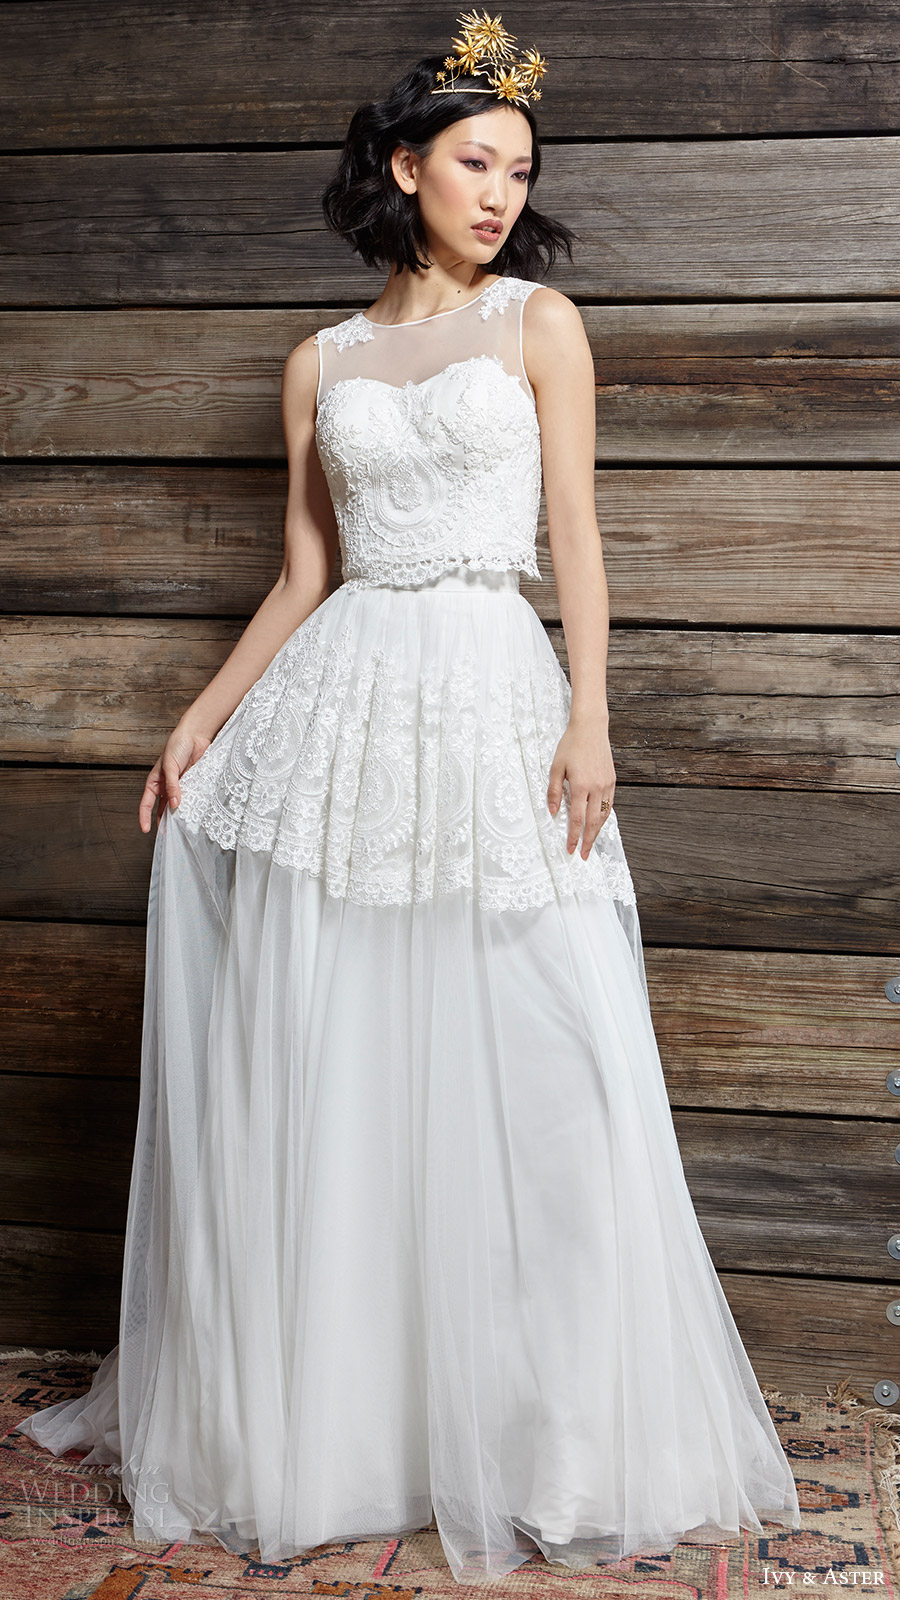 Wedding Dresses Petite Brides 62 Fancy ivy aster bridal spring